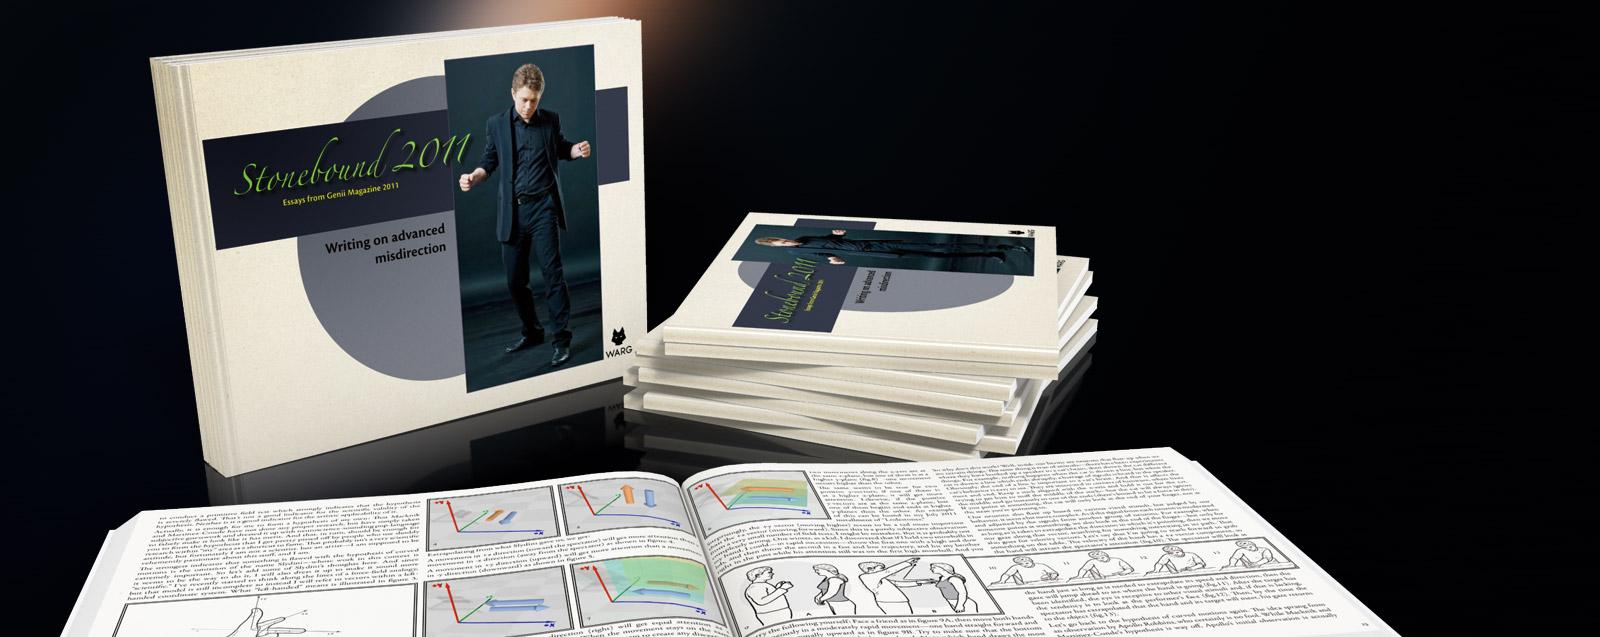 warg magic ebooks